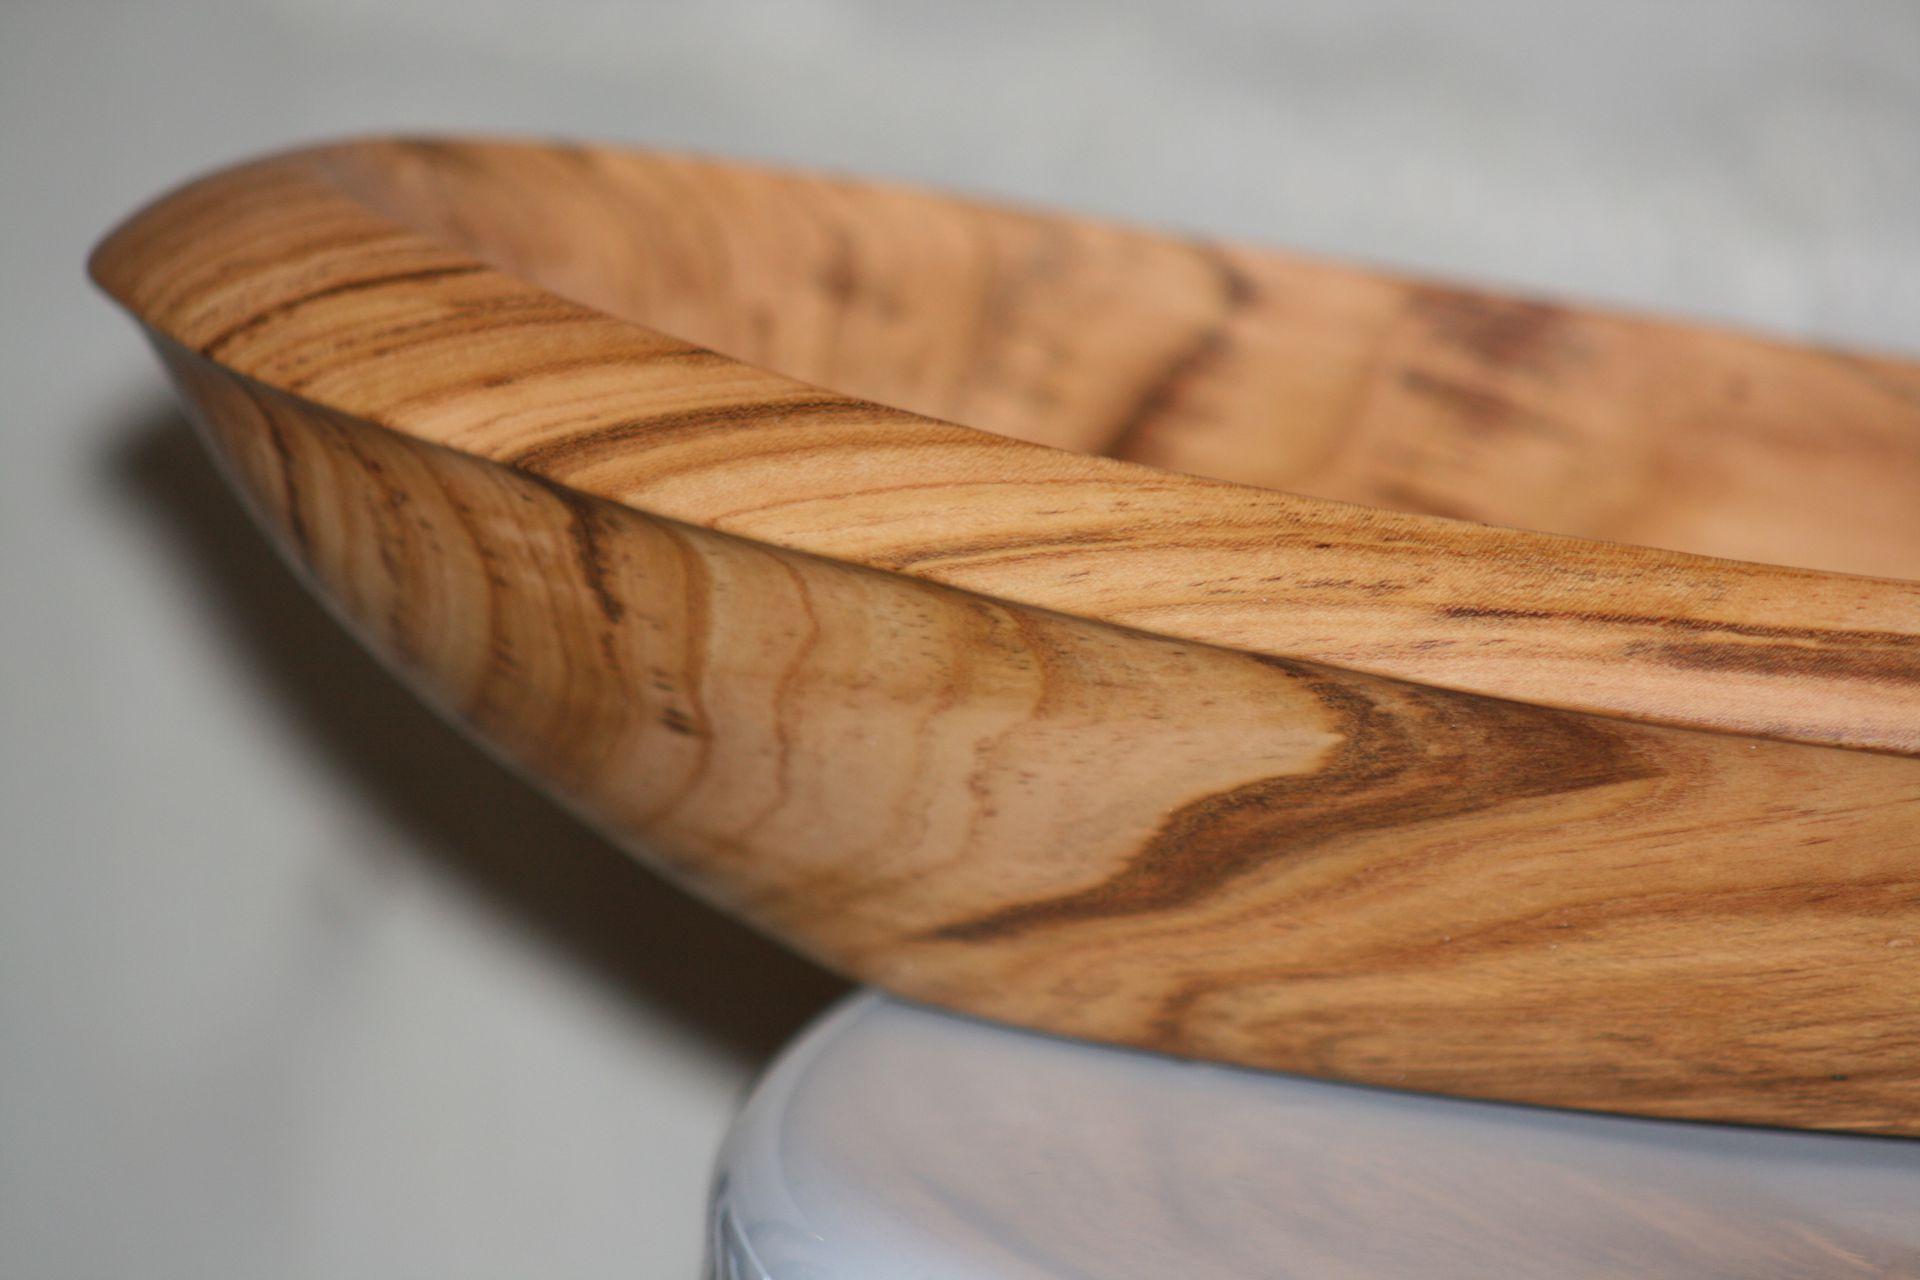 apricot wood bowl texture detail unique handmade sanisio artist design home detail